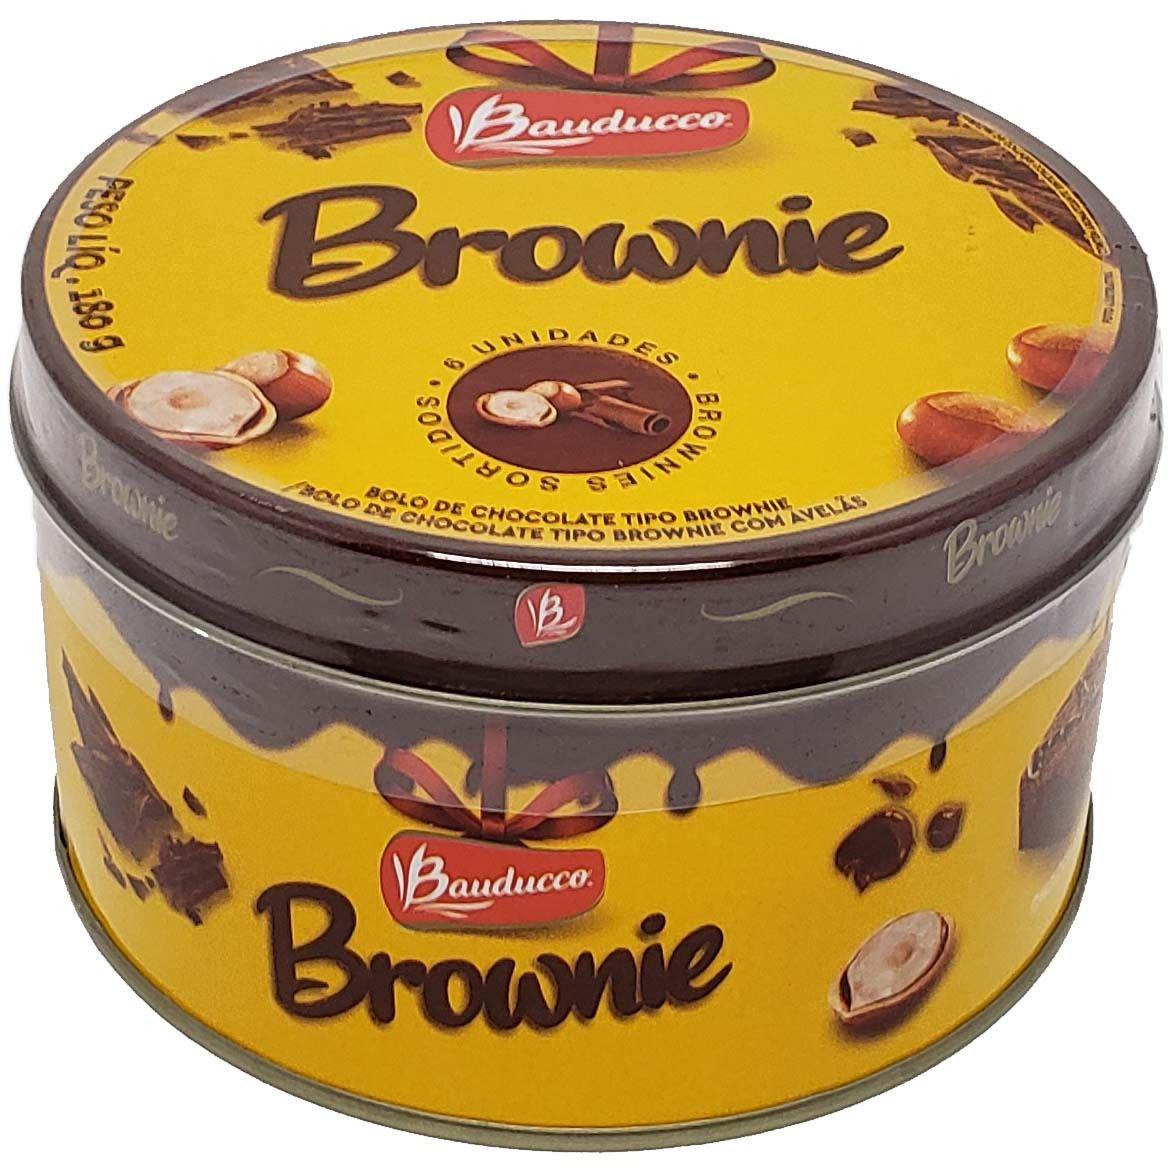 Brownie Bauducco - 180g -